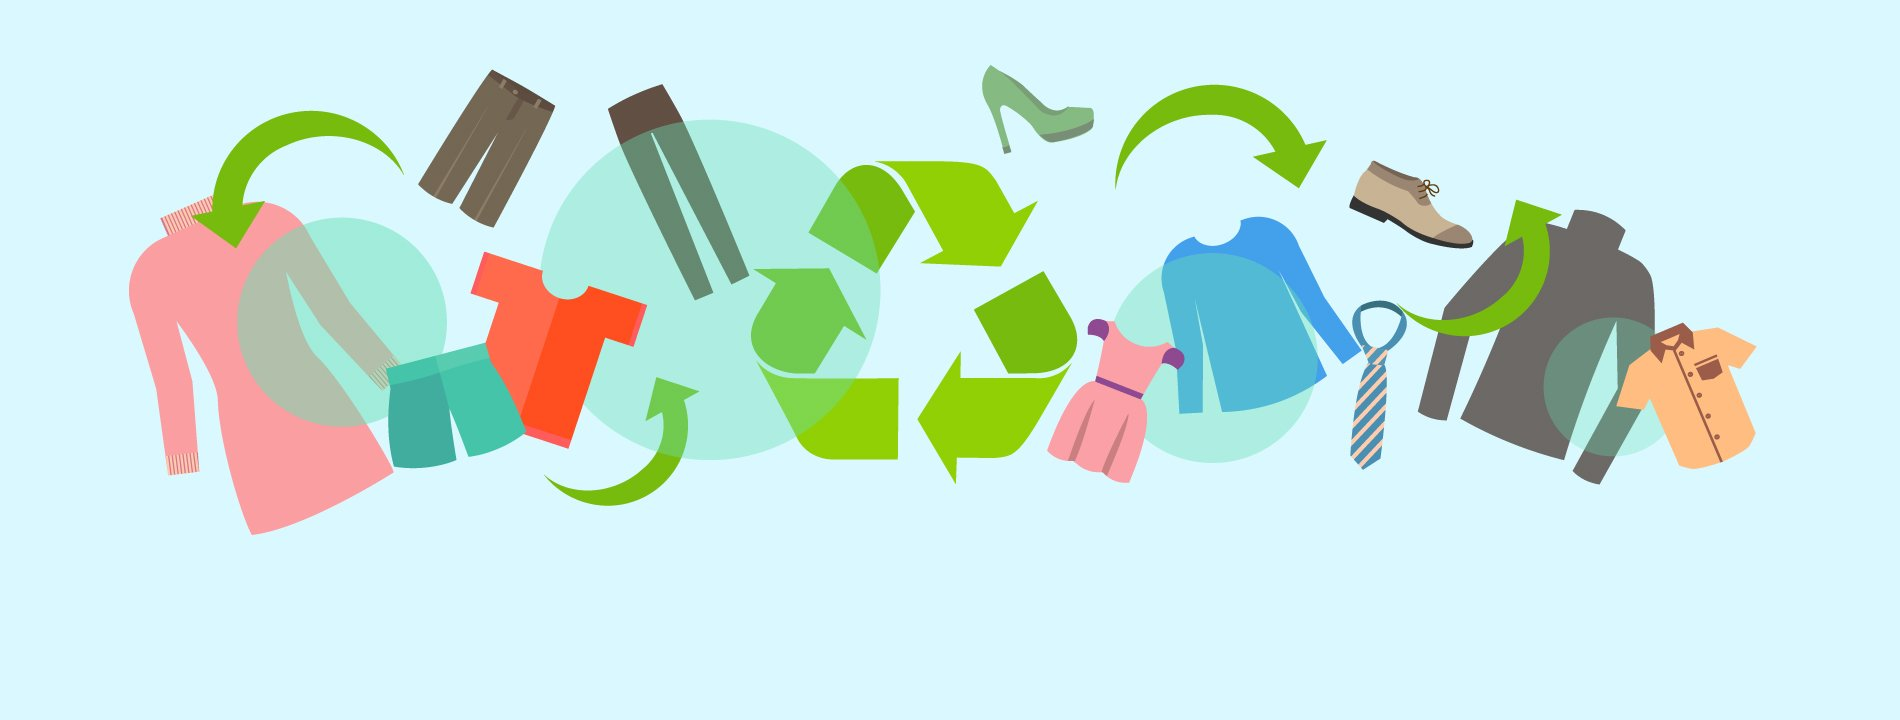 Textile recycling or destruction